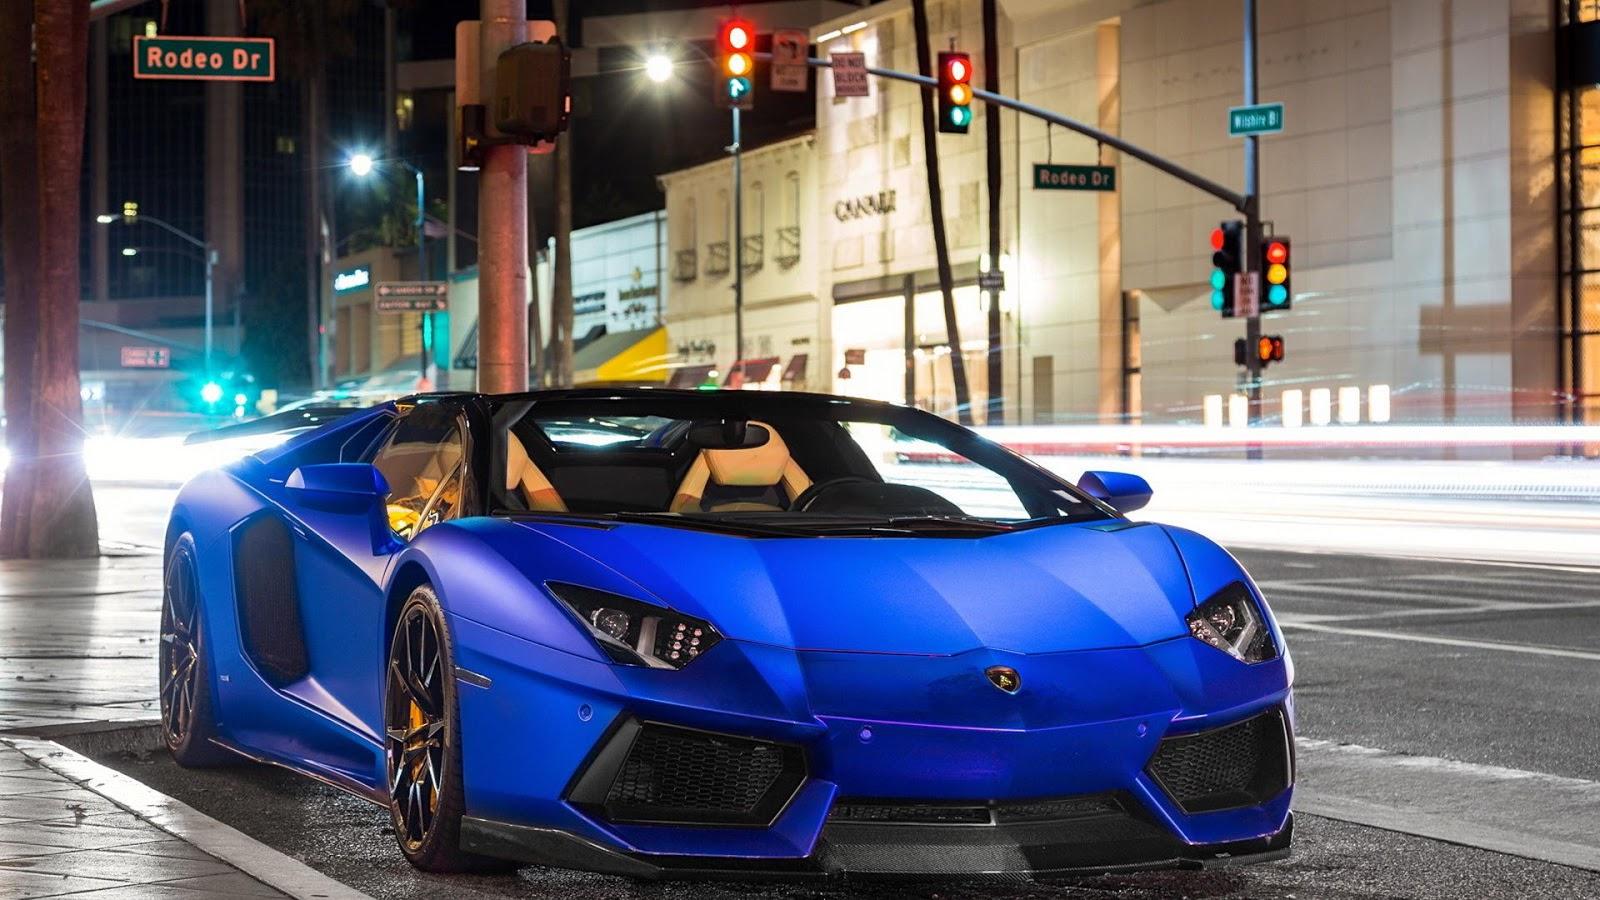 Matte Blue Lamborghini HD Wallpaper